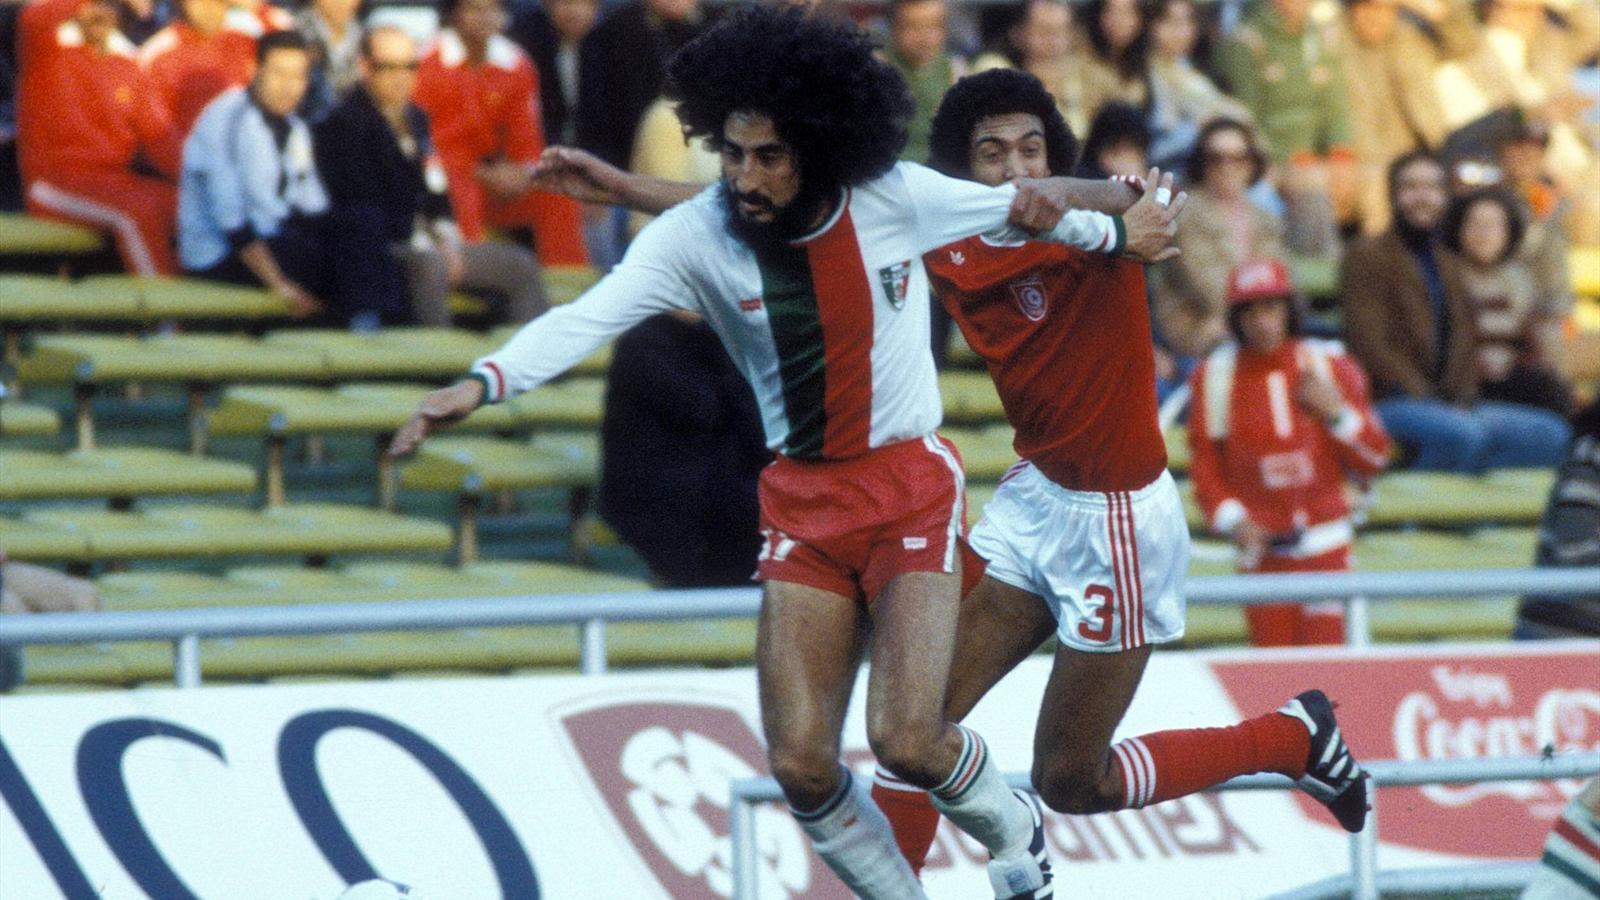 Leonardo cuellar mexique tunisie coupe du monde 1978 - Finale coupe du monde 1978 ...